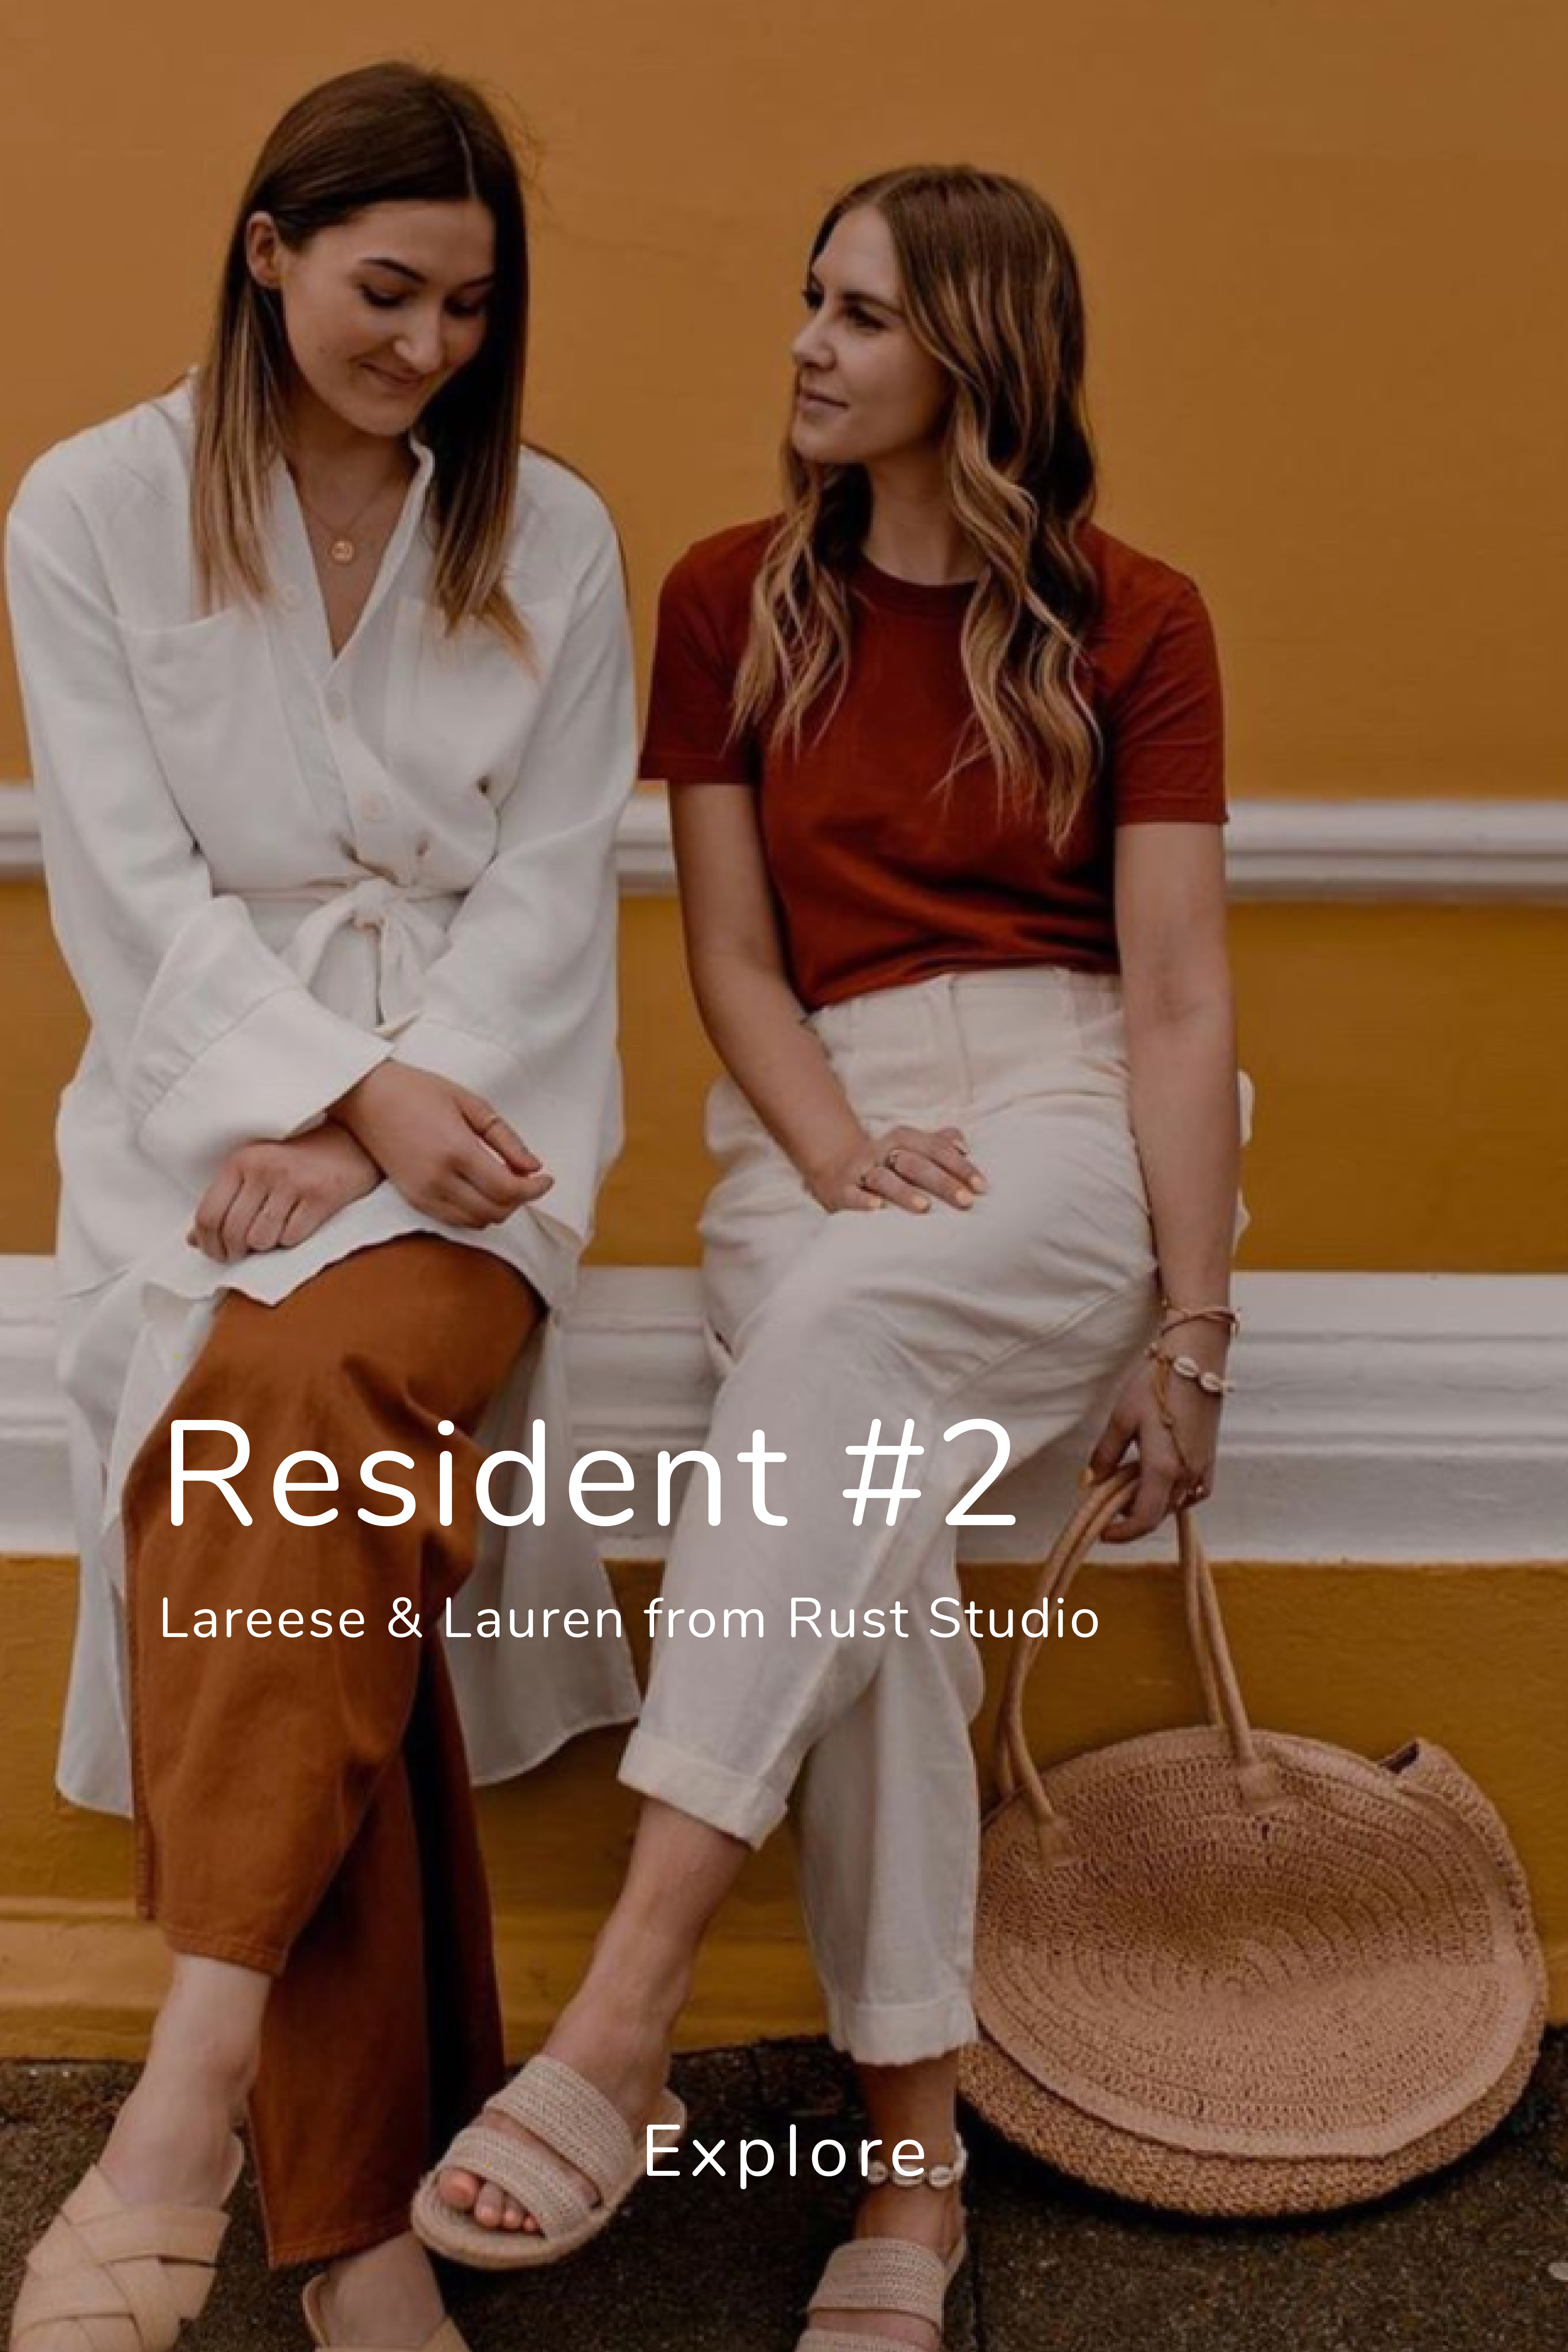 Resident #2 Rust Studio